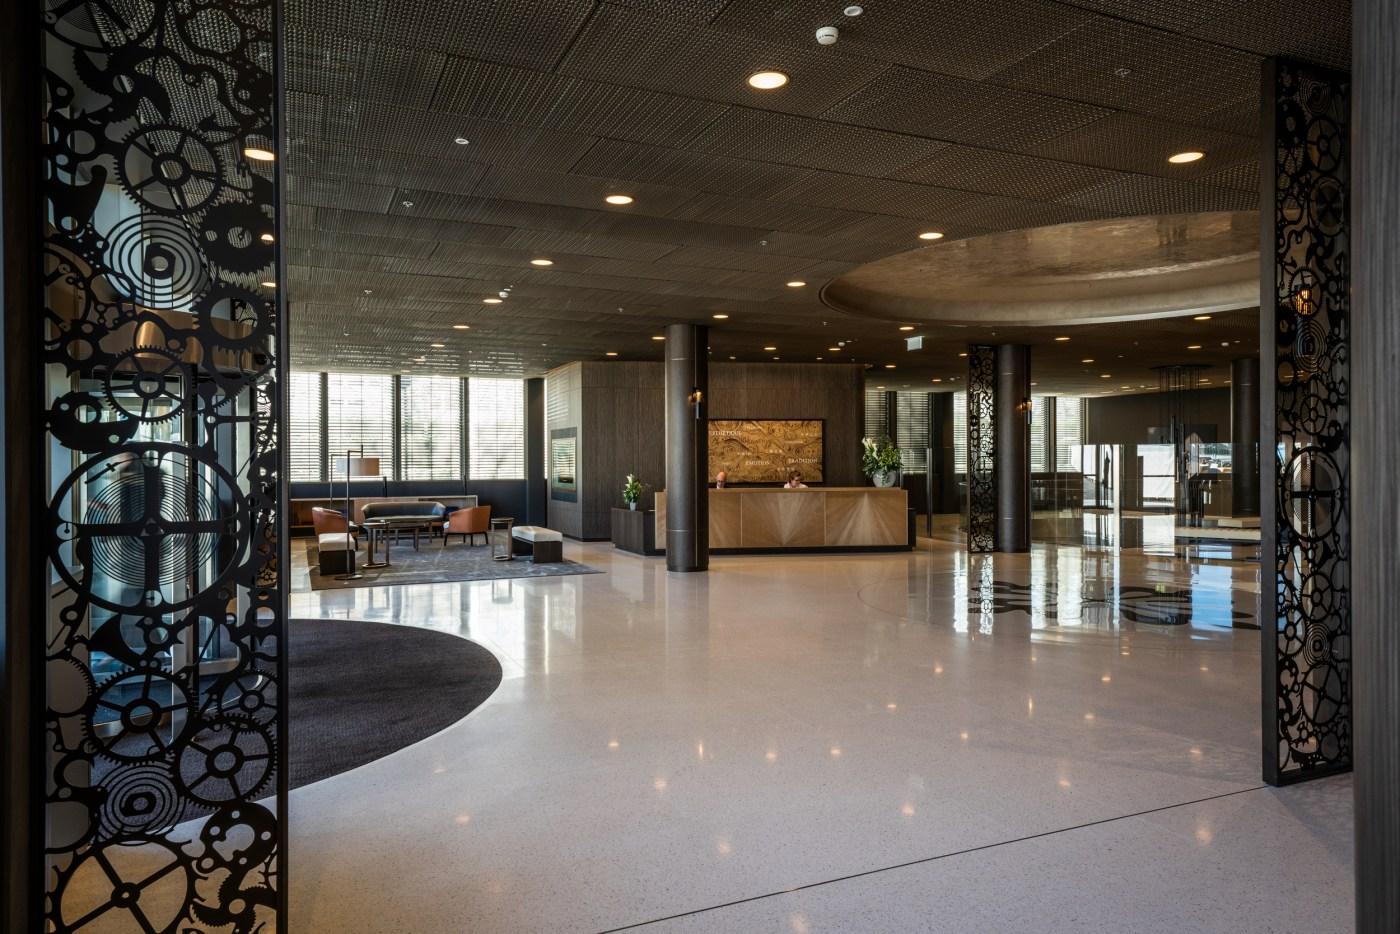 2020 Patek Philippe Plan-les-Ouates Geneva manufacture lobby